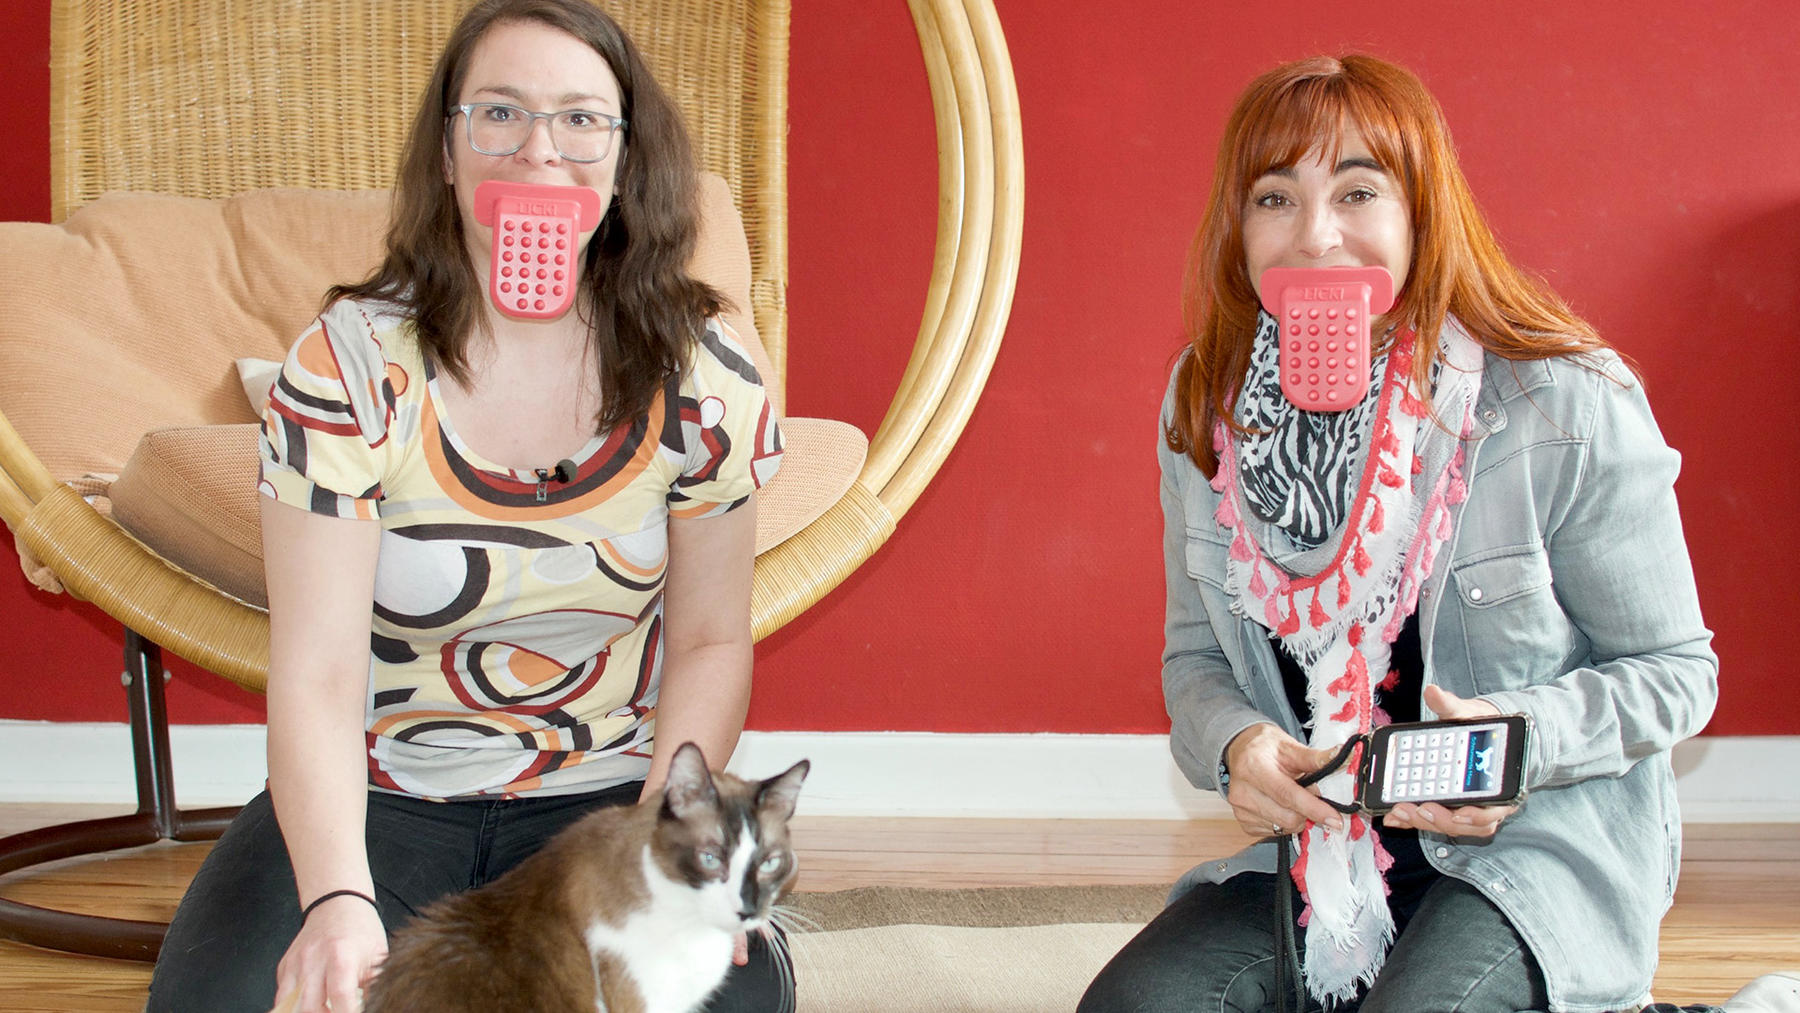 Thema heute u.a.: Katzengadgets 2.0